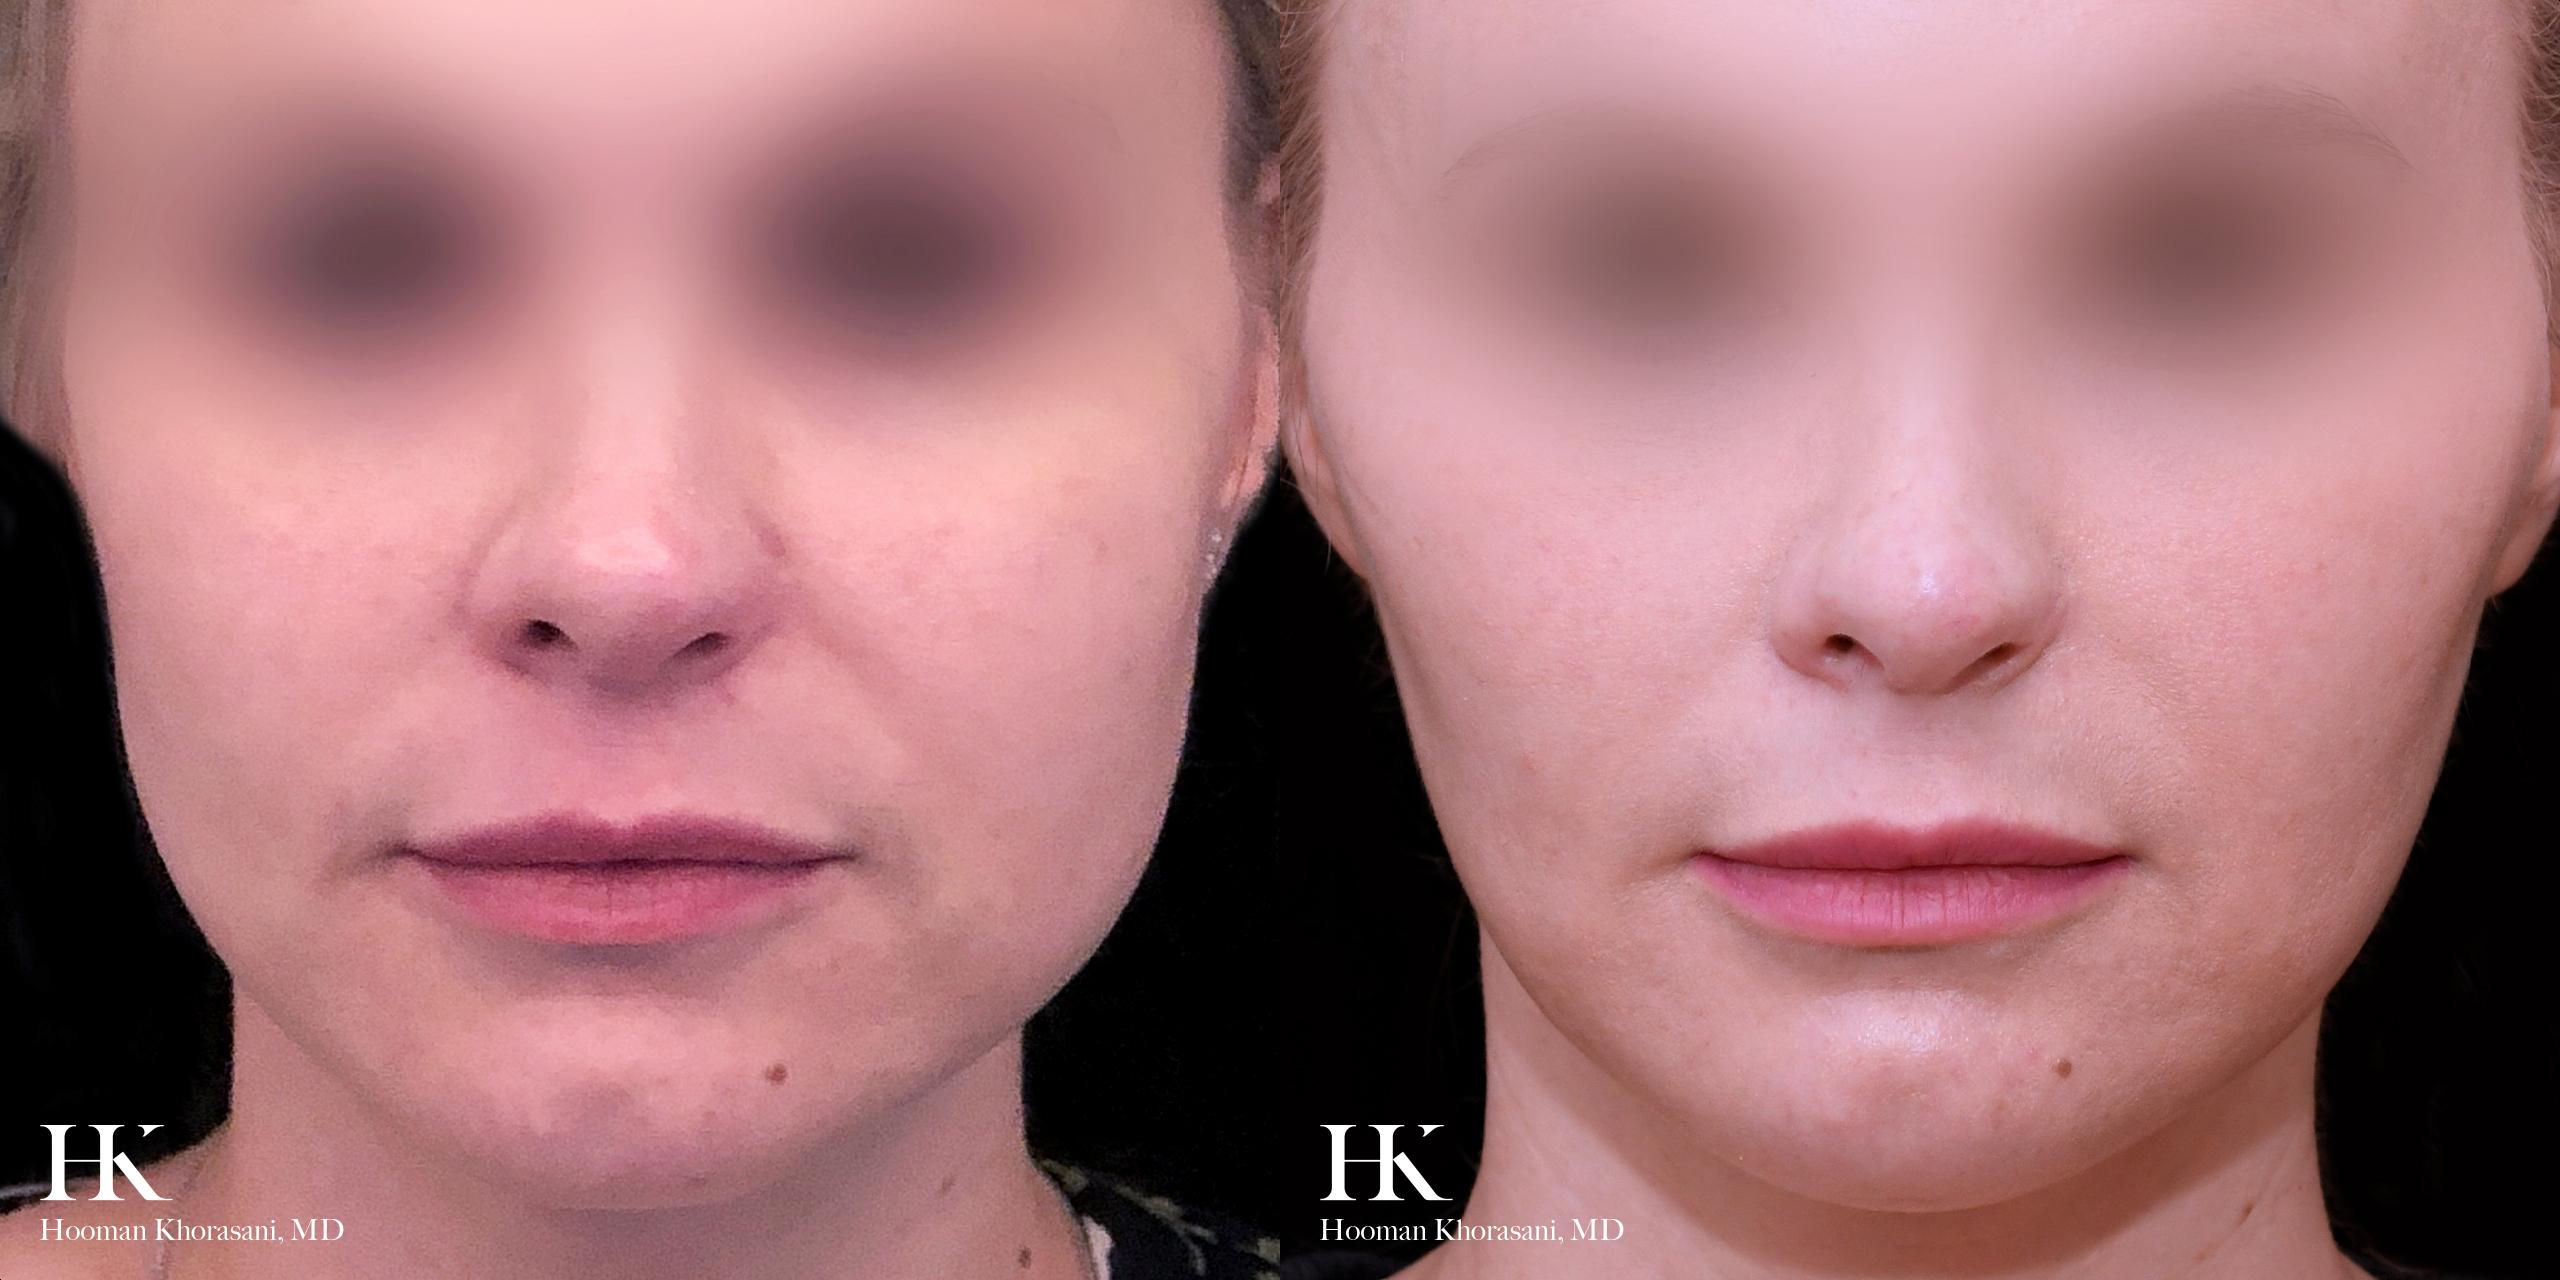 Cheek Reduction by Hooman Khorasani, MD